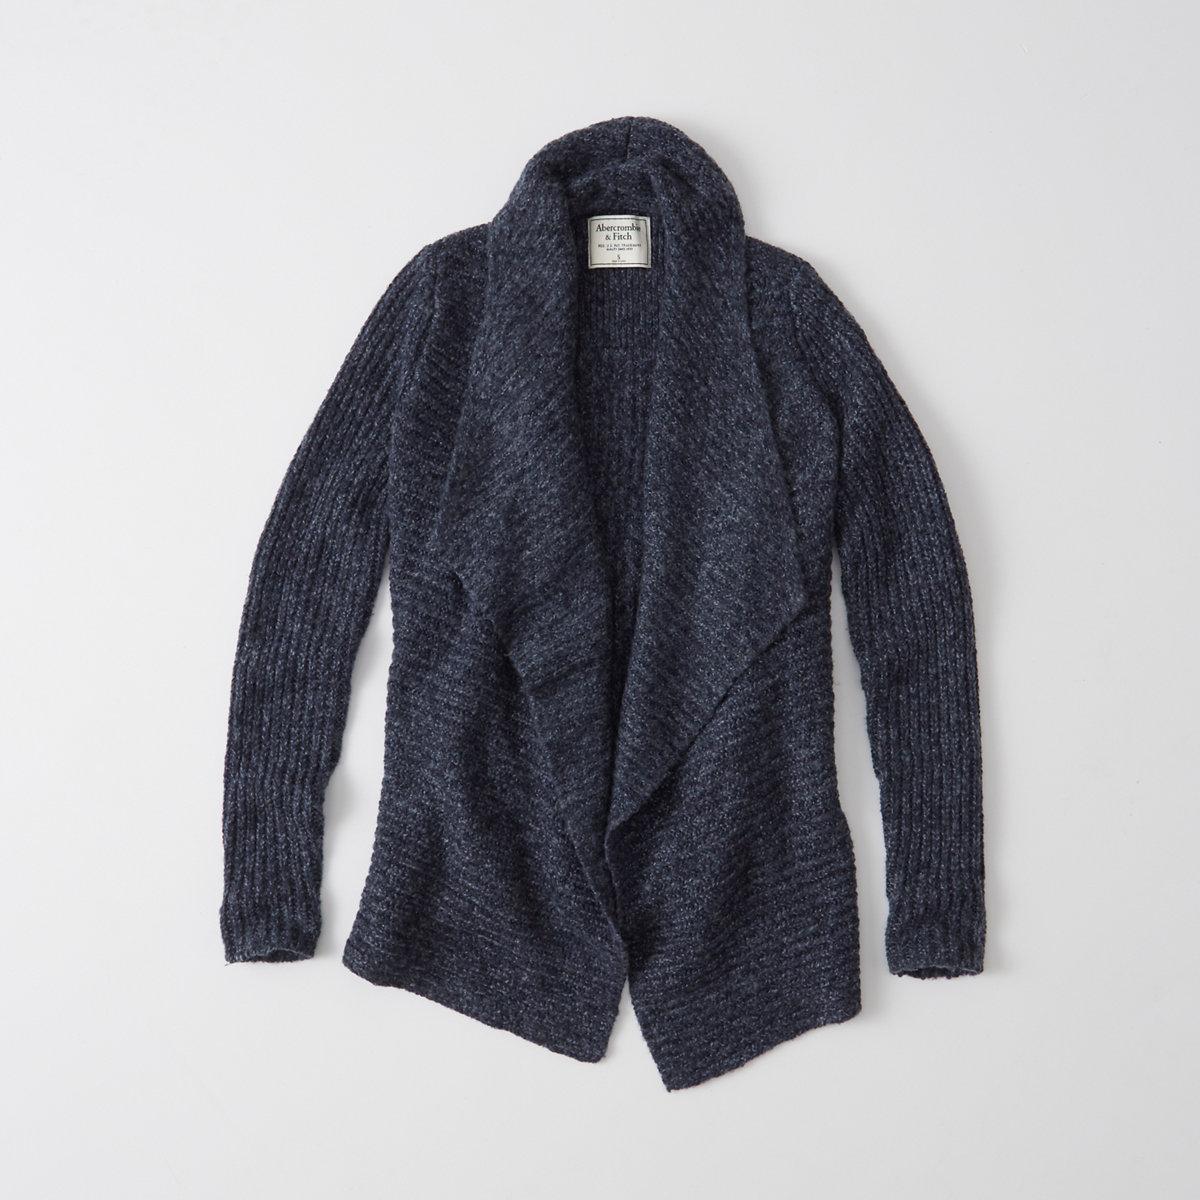 Stitch Mix Blanket Cardigan